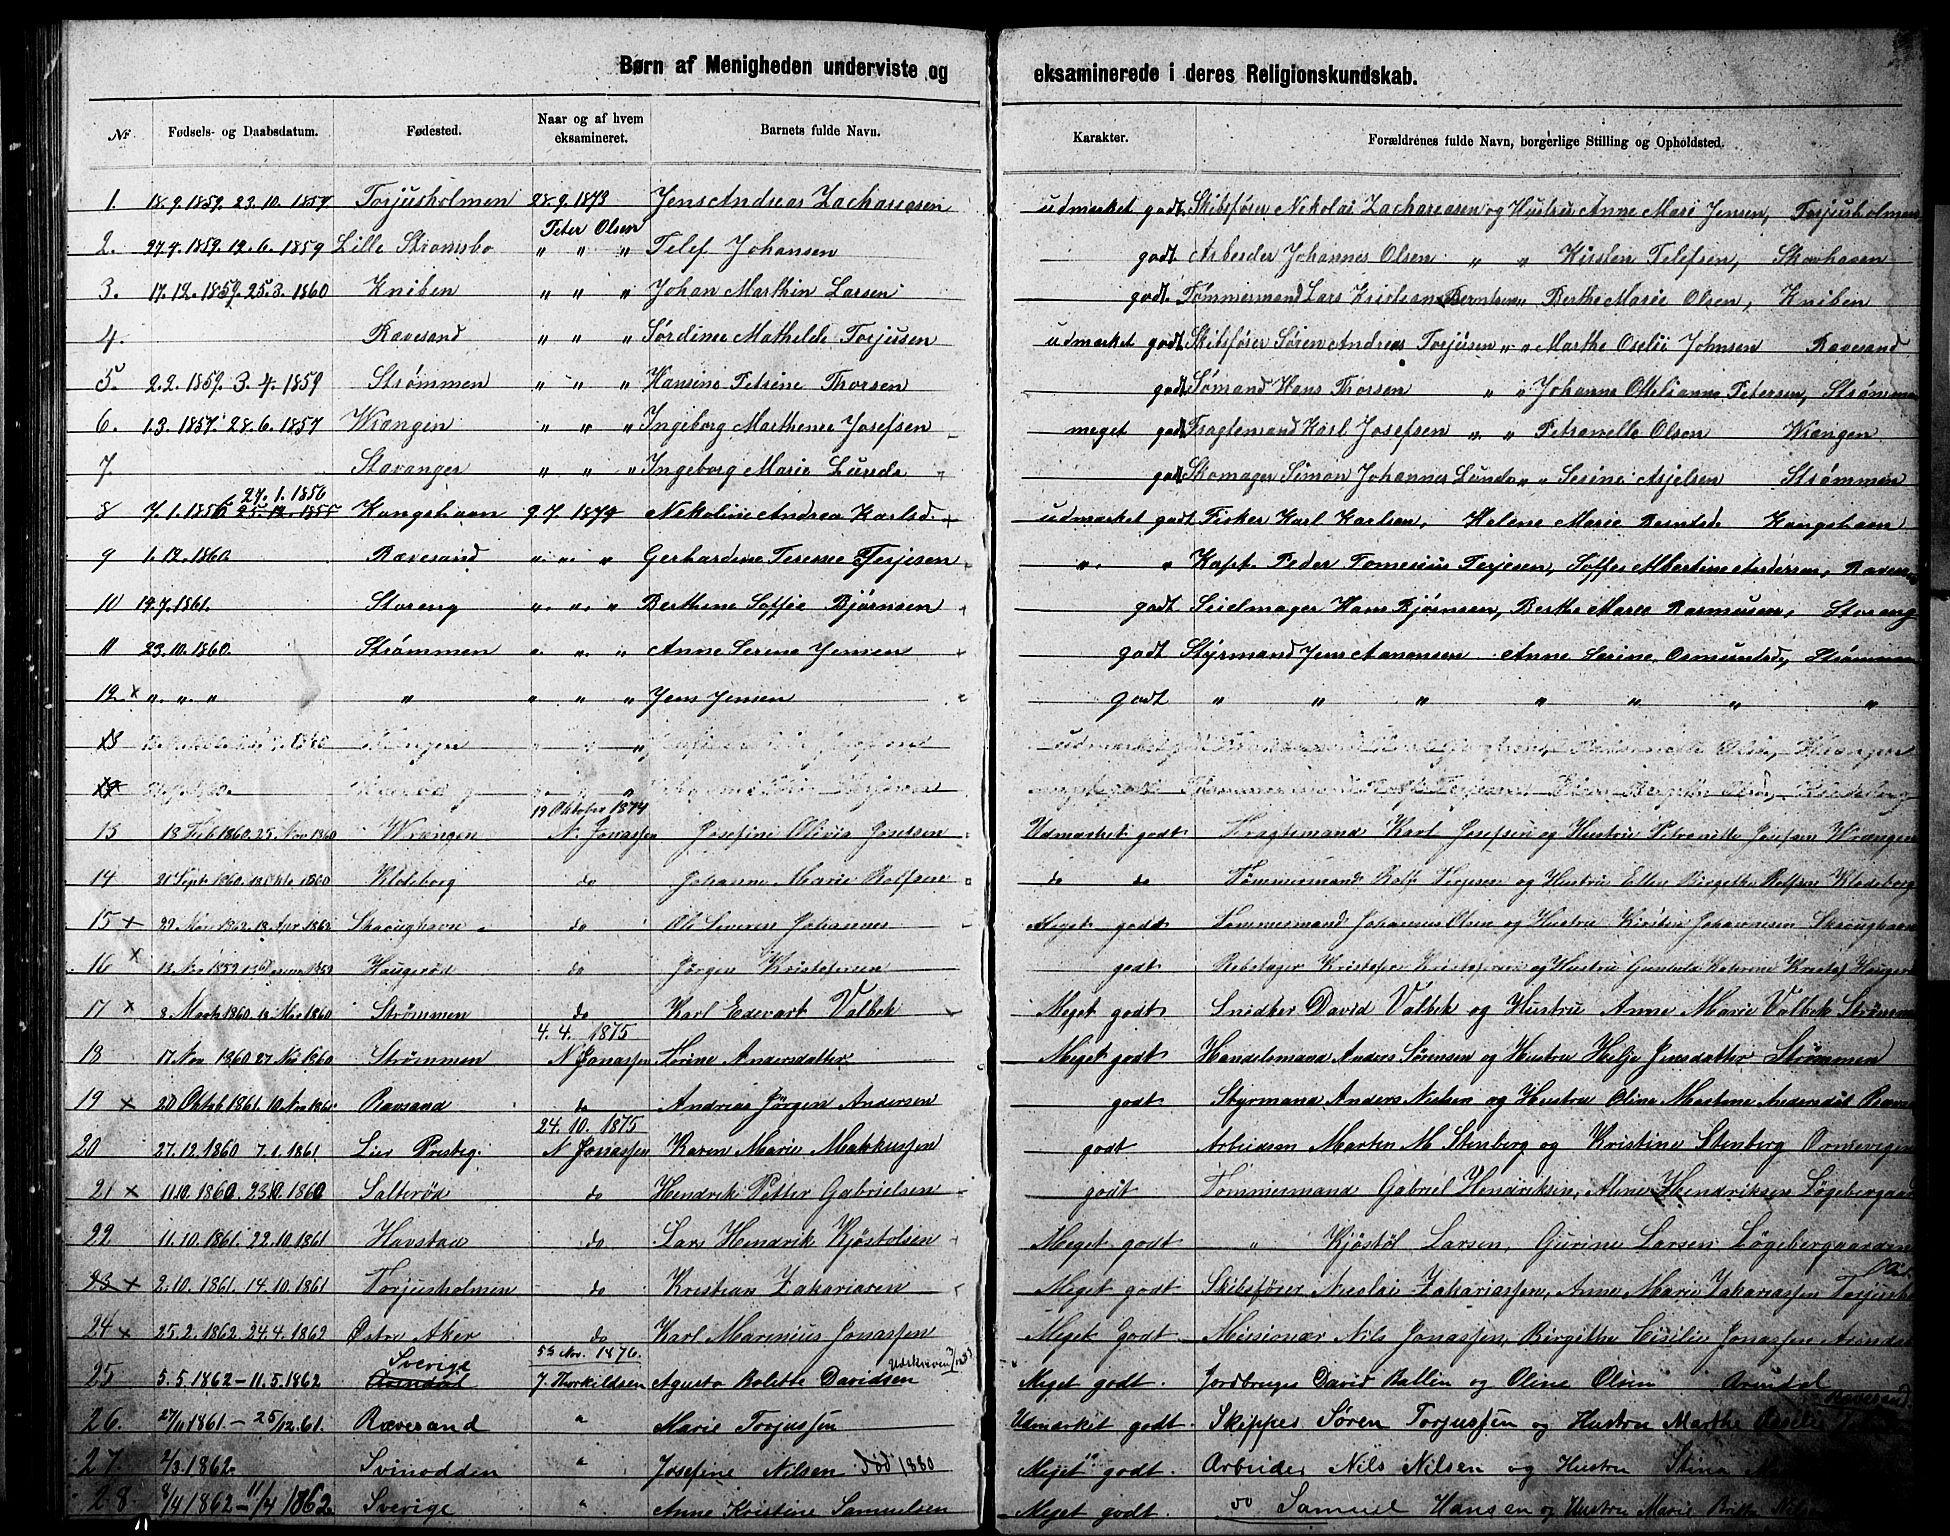 SAK, Metodistmenigheten, Arendal, F/Fa/L0002: Dissenterprotokoll nr. F-3, 1867-1884